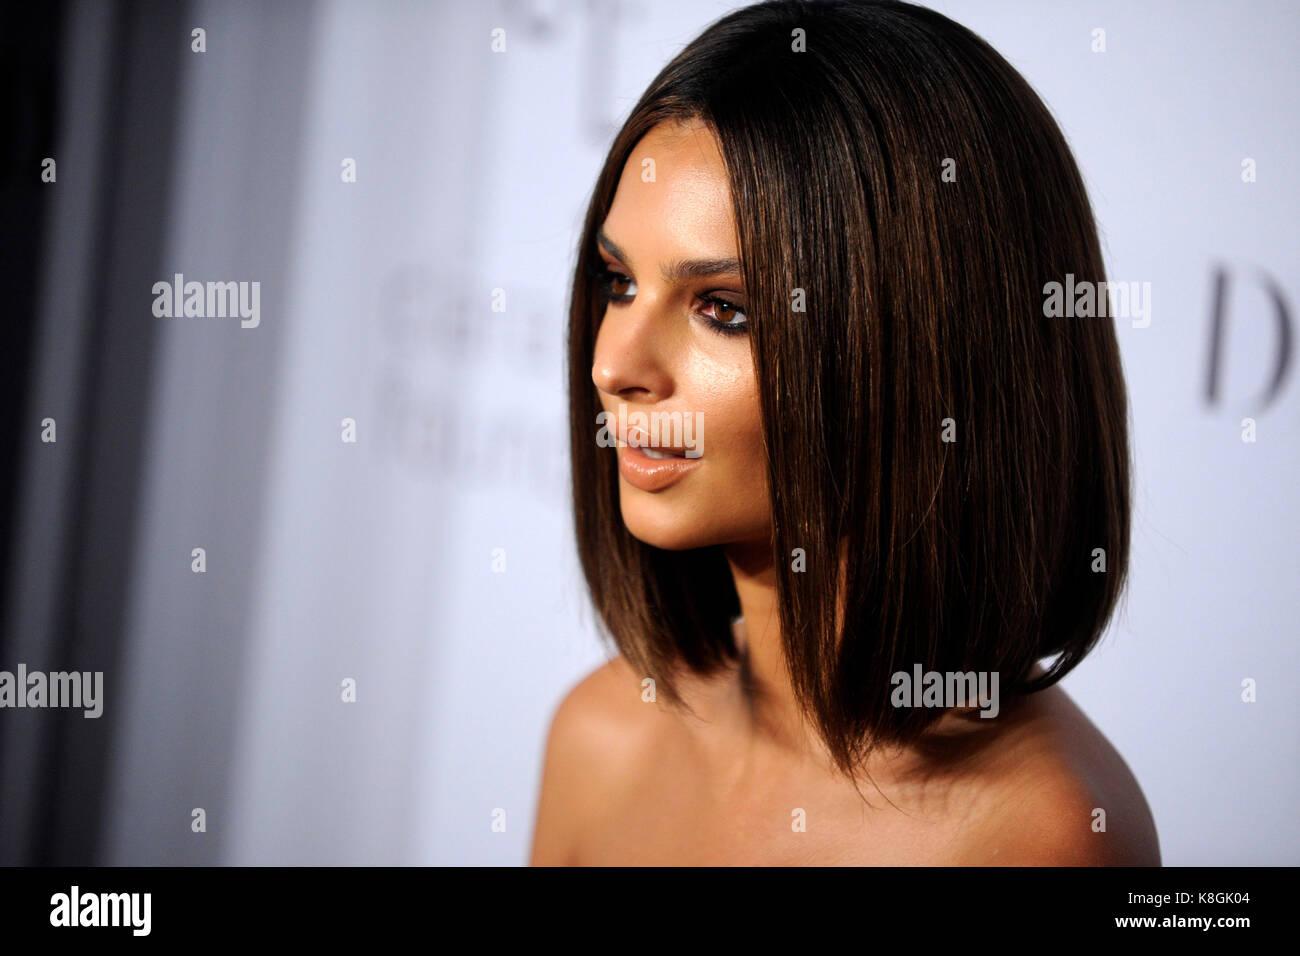 Emily ratajkowski besucht 3. jährlichen Diamond's Rihanna ball Clara lionel Stiftung bei Cipriani wall Stockbild